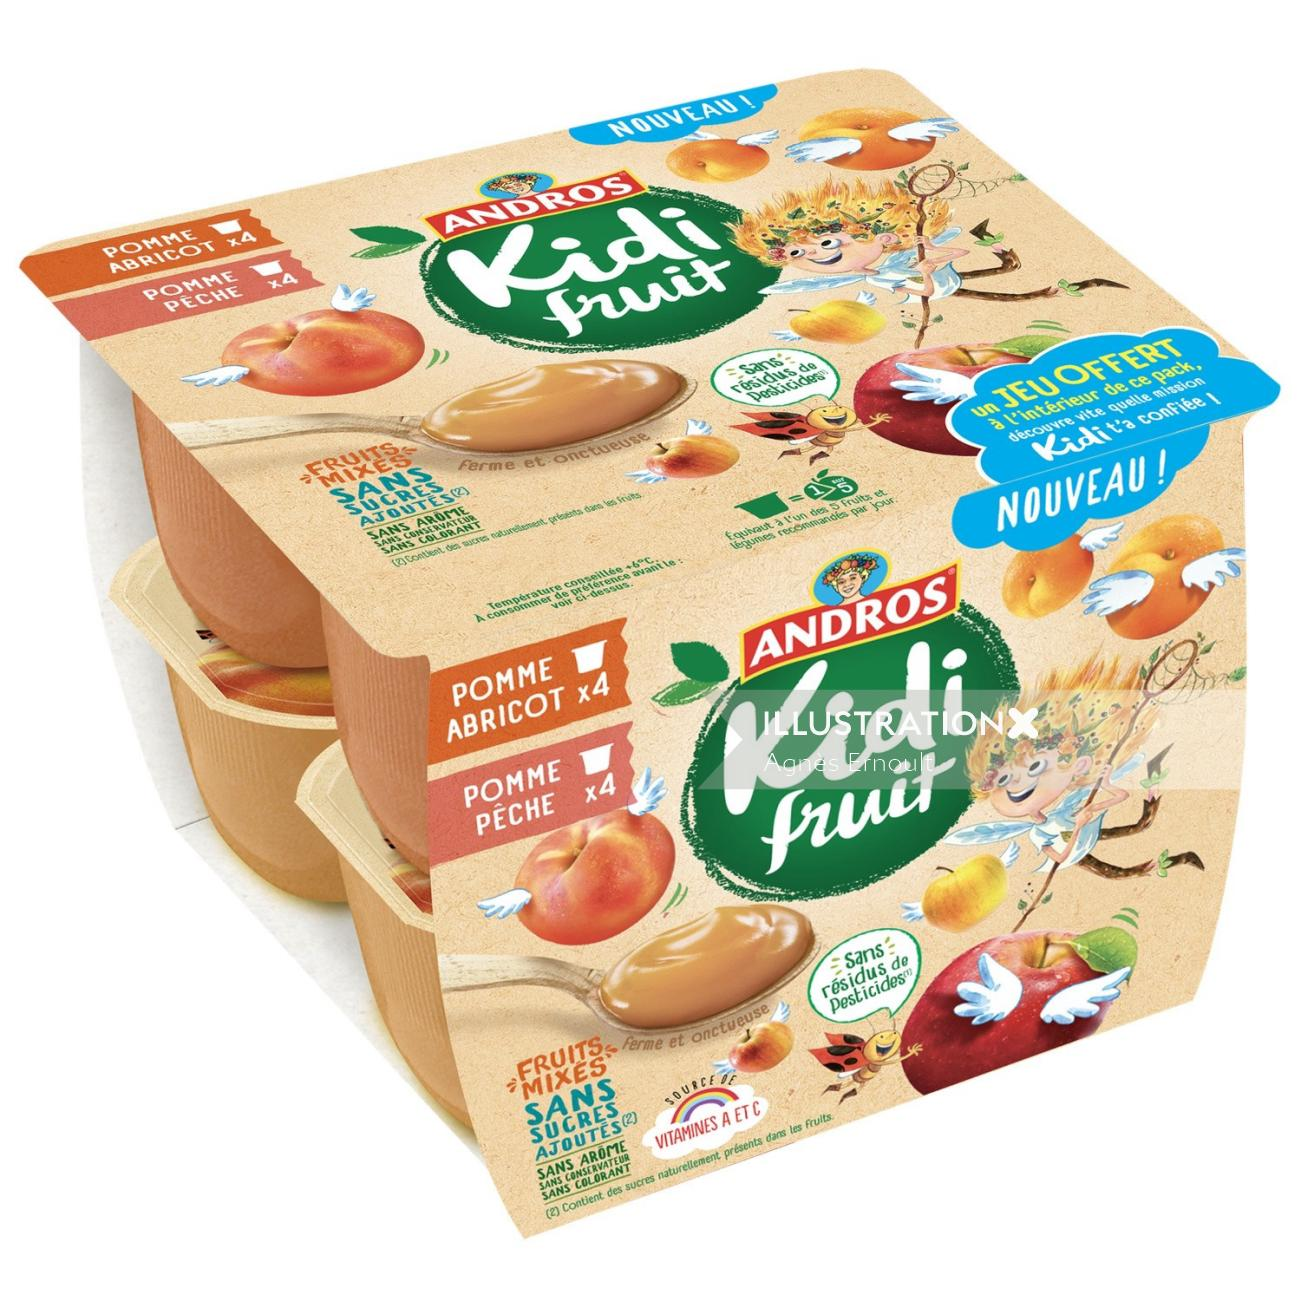 Packaging illustration of Andros kidi fruit